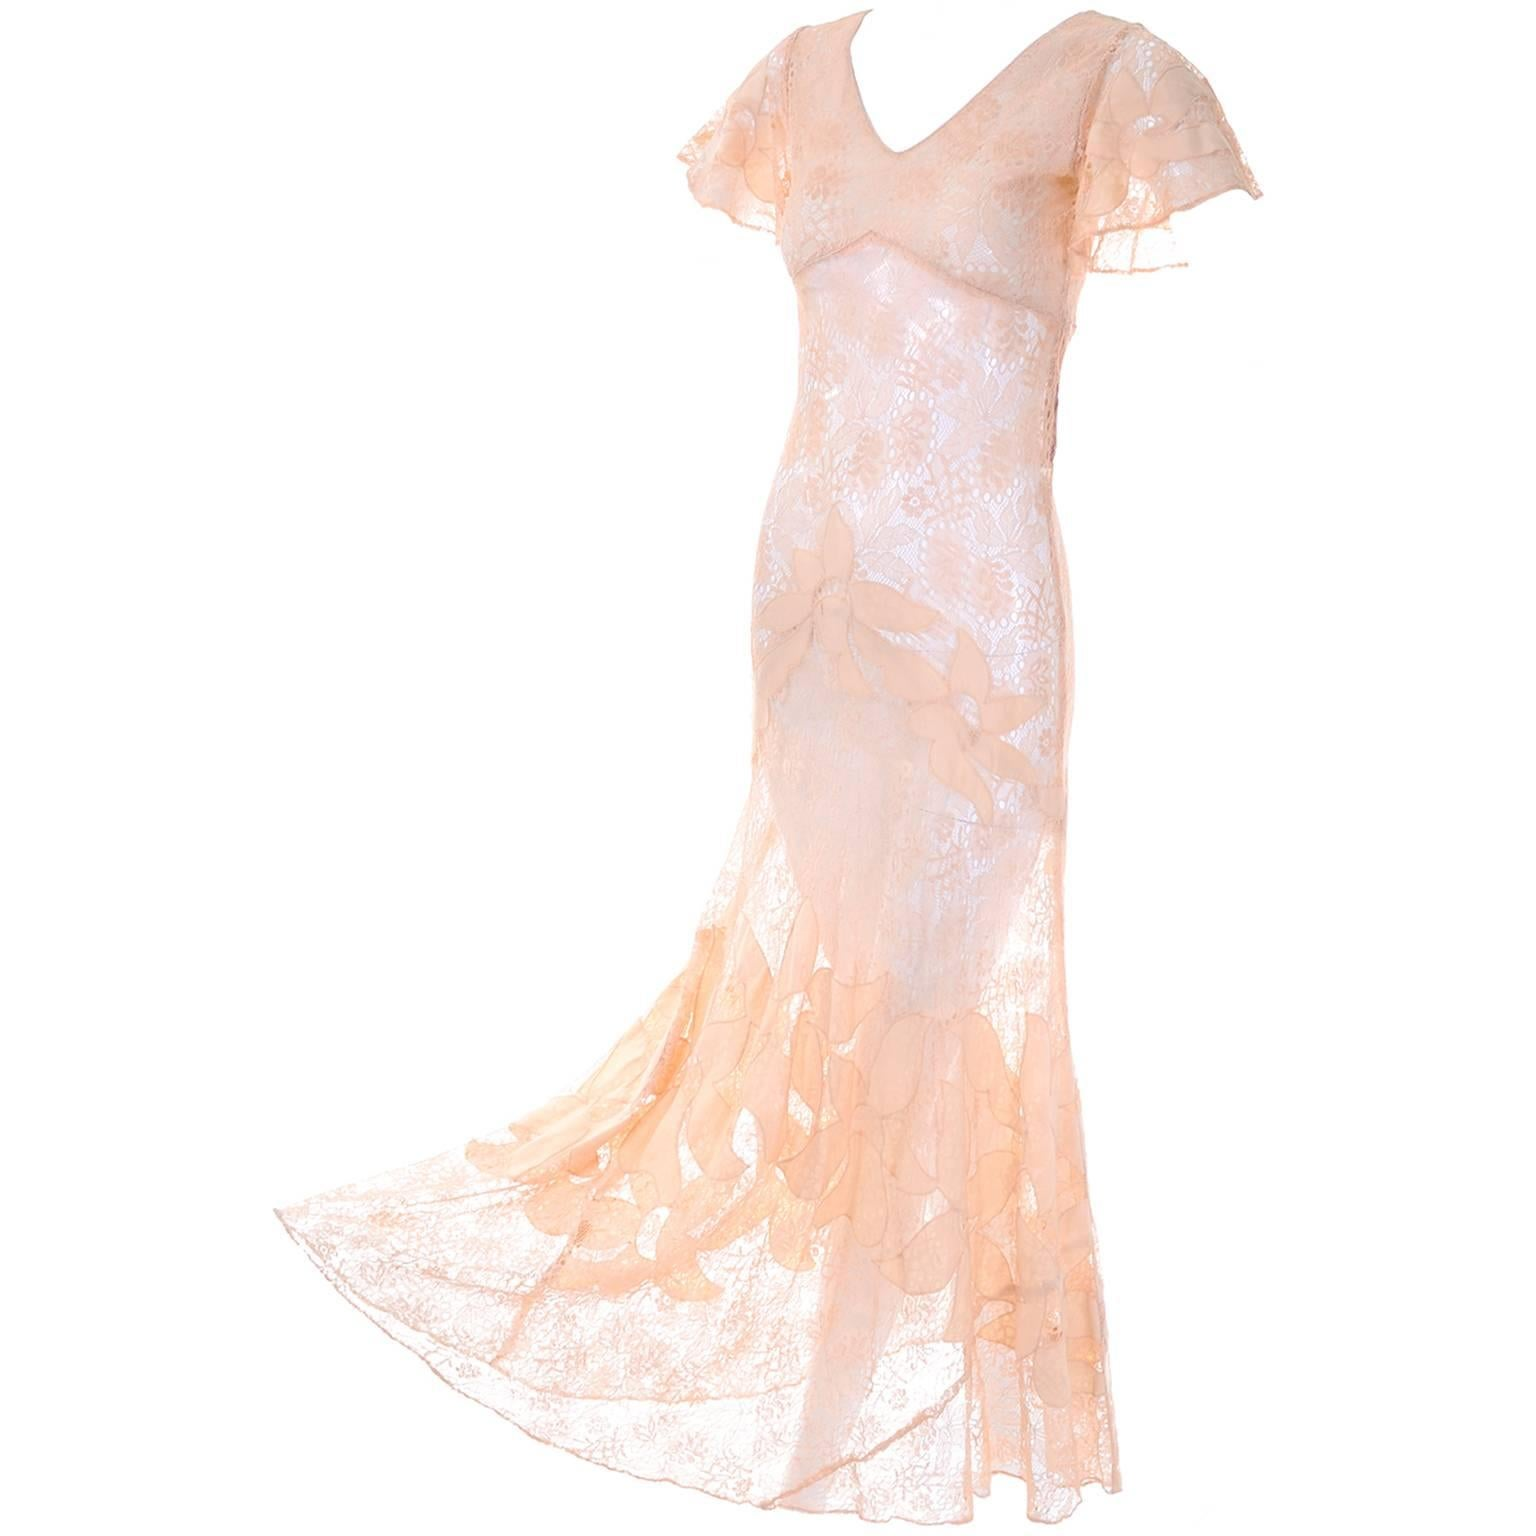 1930s Bias Silk and Lace Vintage Dress in Peach W Appliqués ...